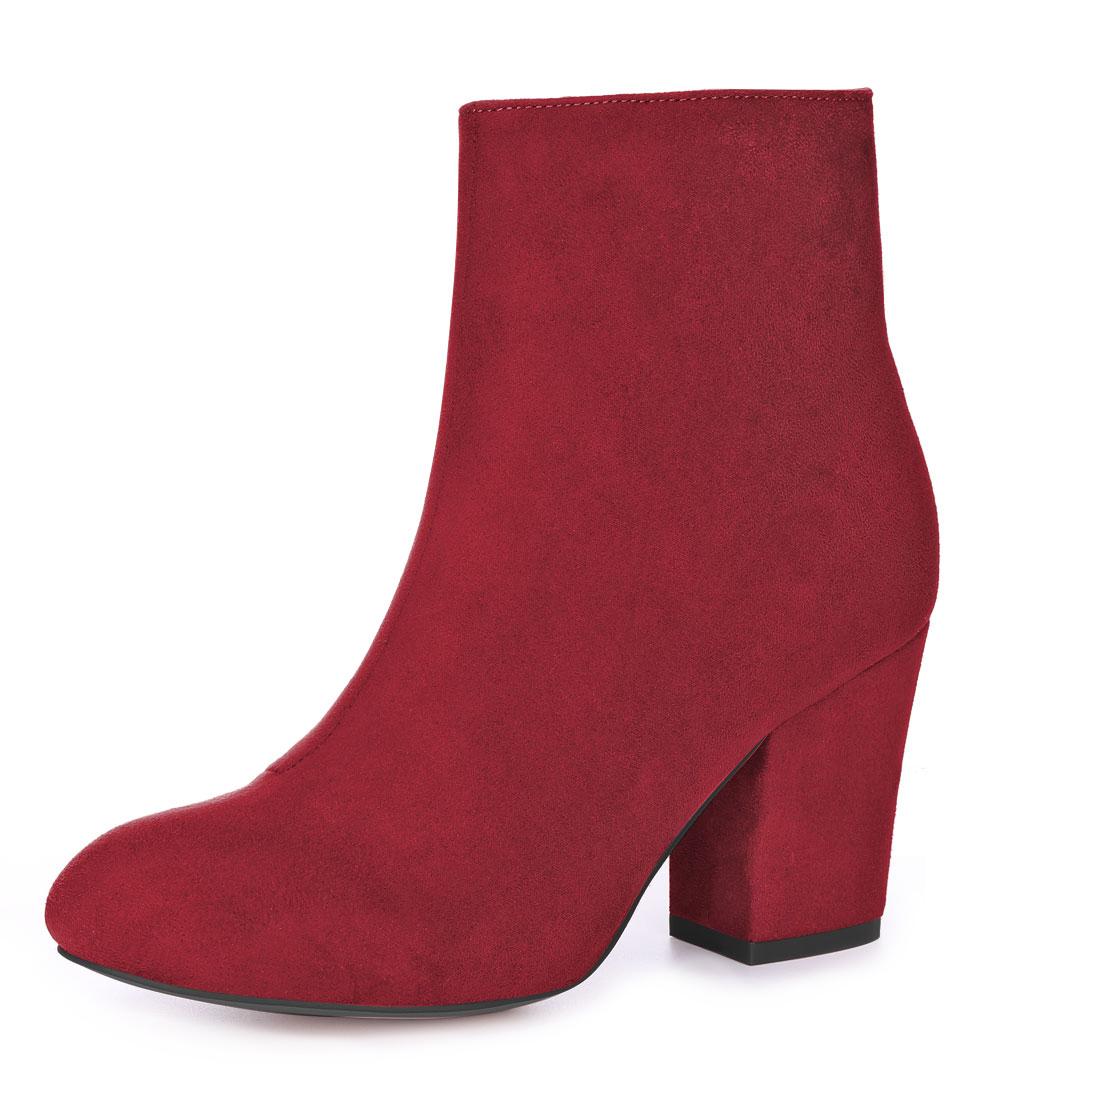 Allegra K Women Round Toe Side Zipper Block Heel Ankle Boots Red US 7